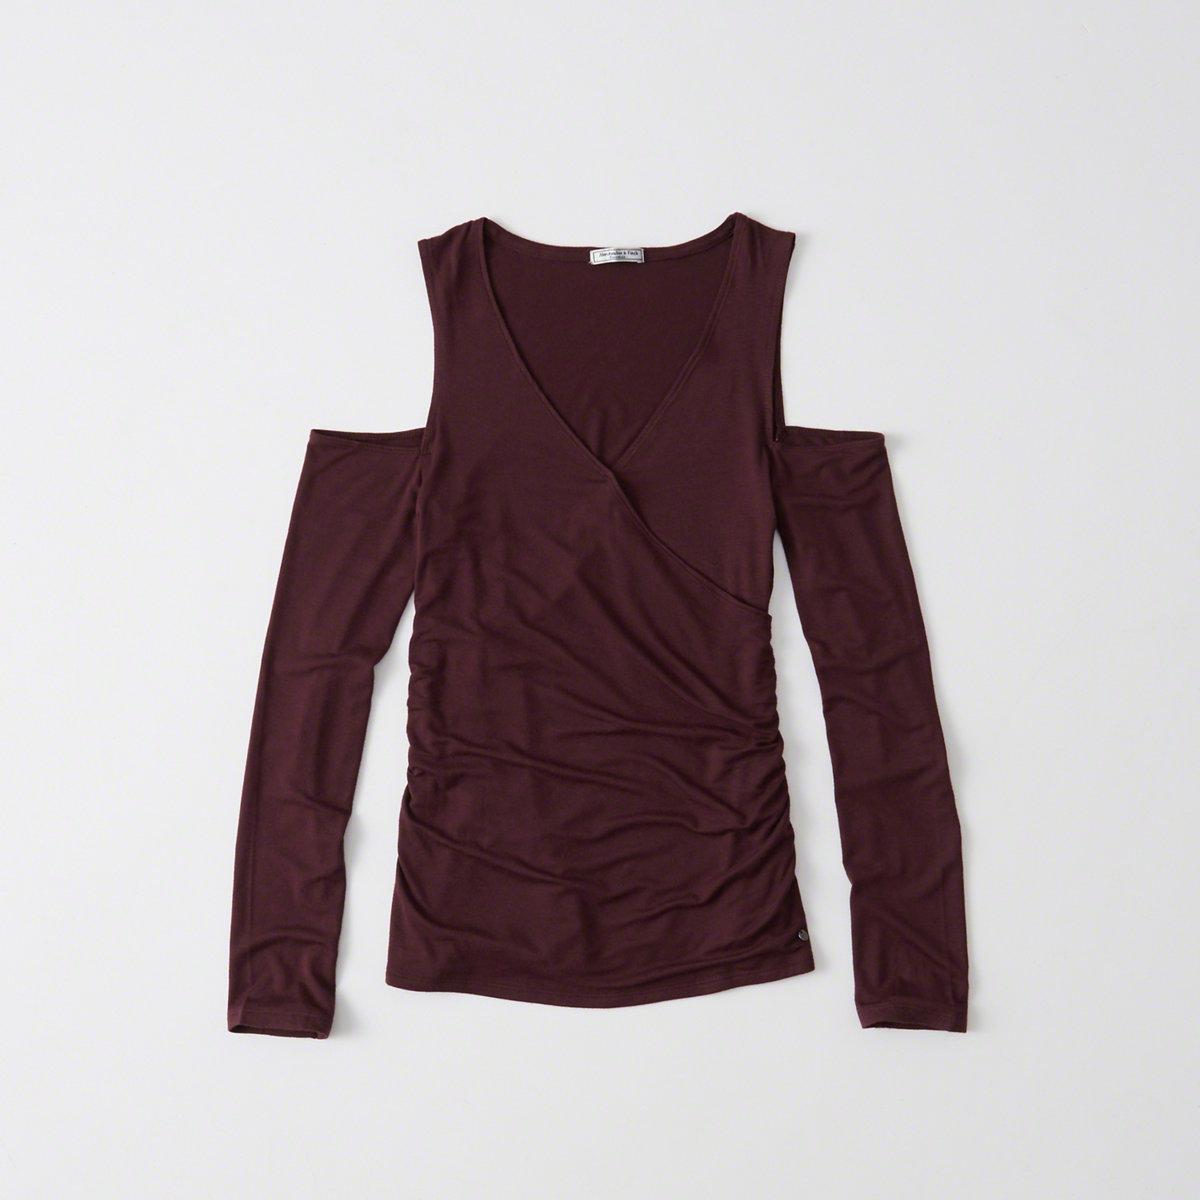 b4a6a6a3e3a14 Lyst - Abercrombie   Fitch Cold Shoulder Wrap Top in Purple